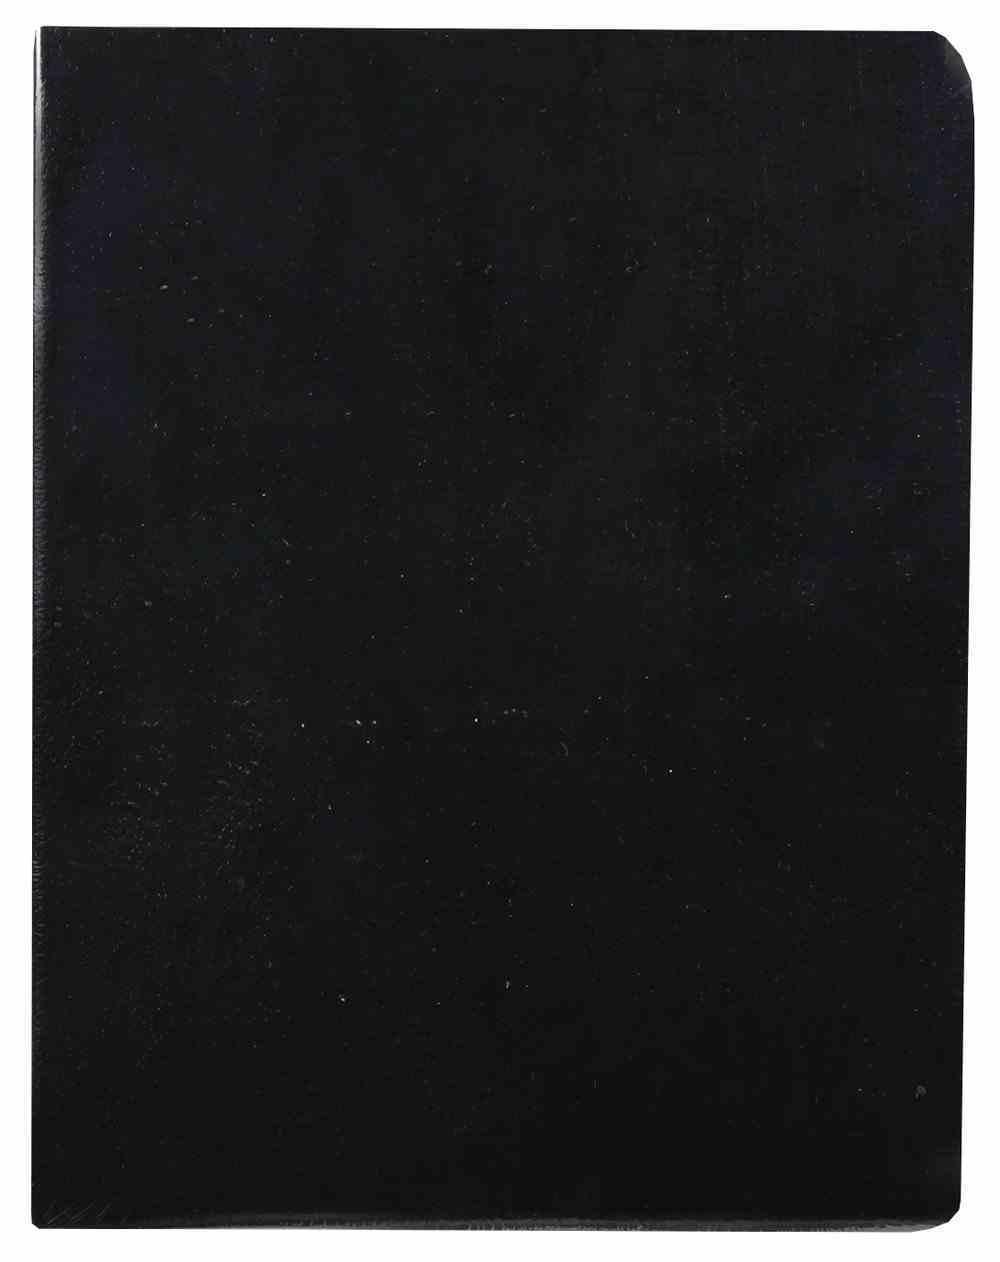 NKJV Dake Bible Black Bonded Leather